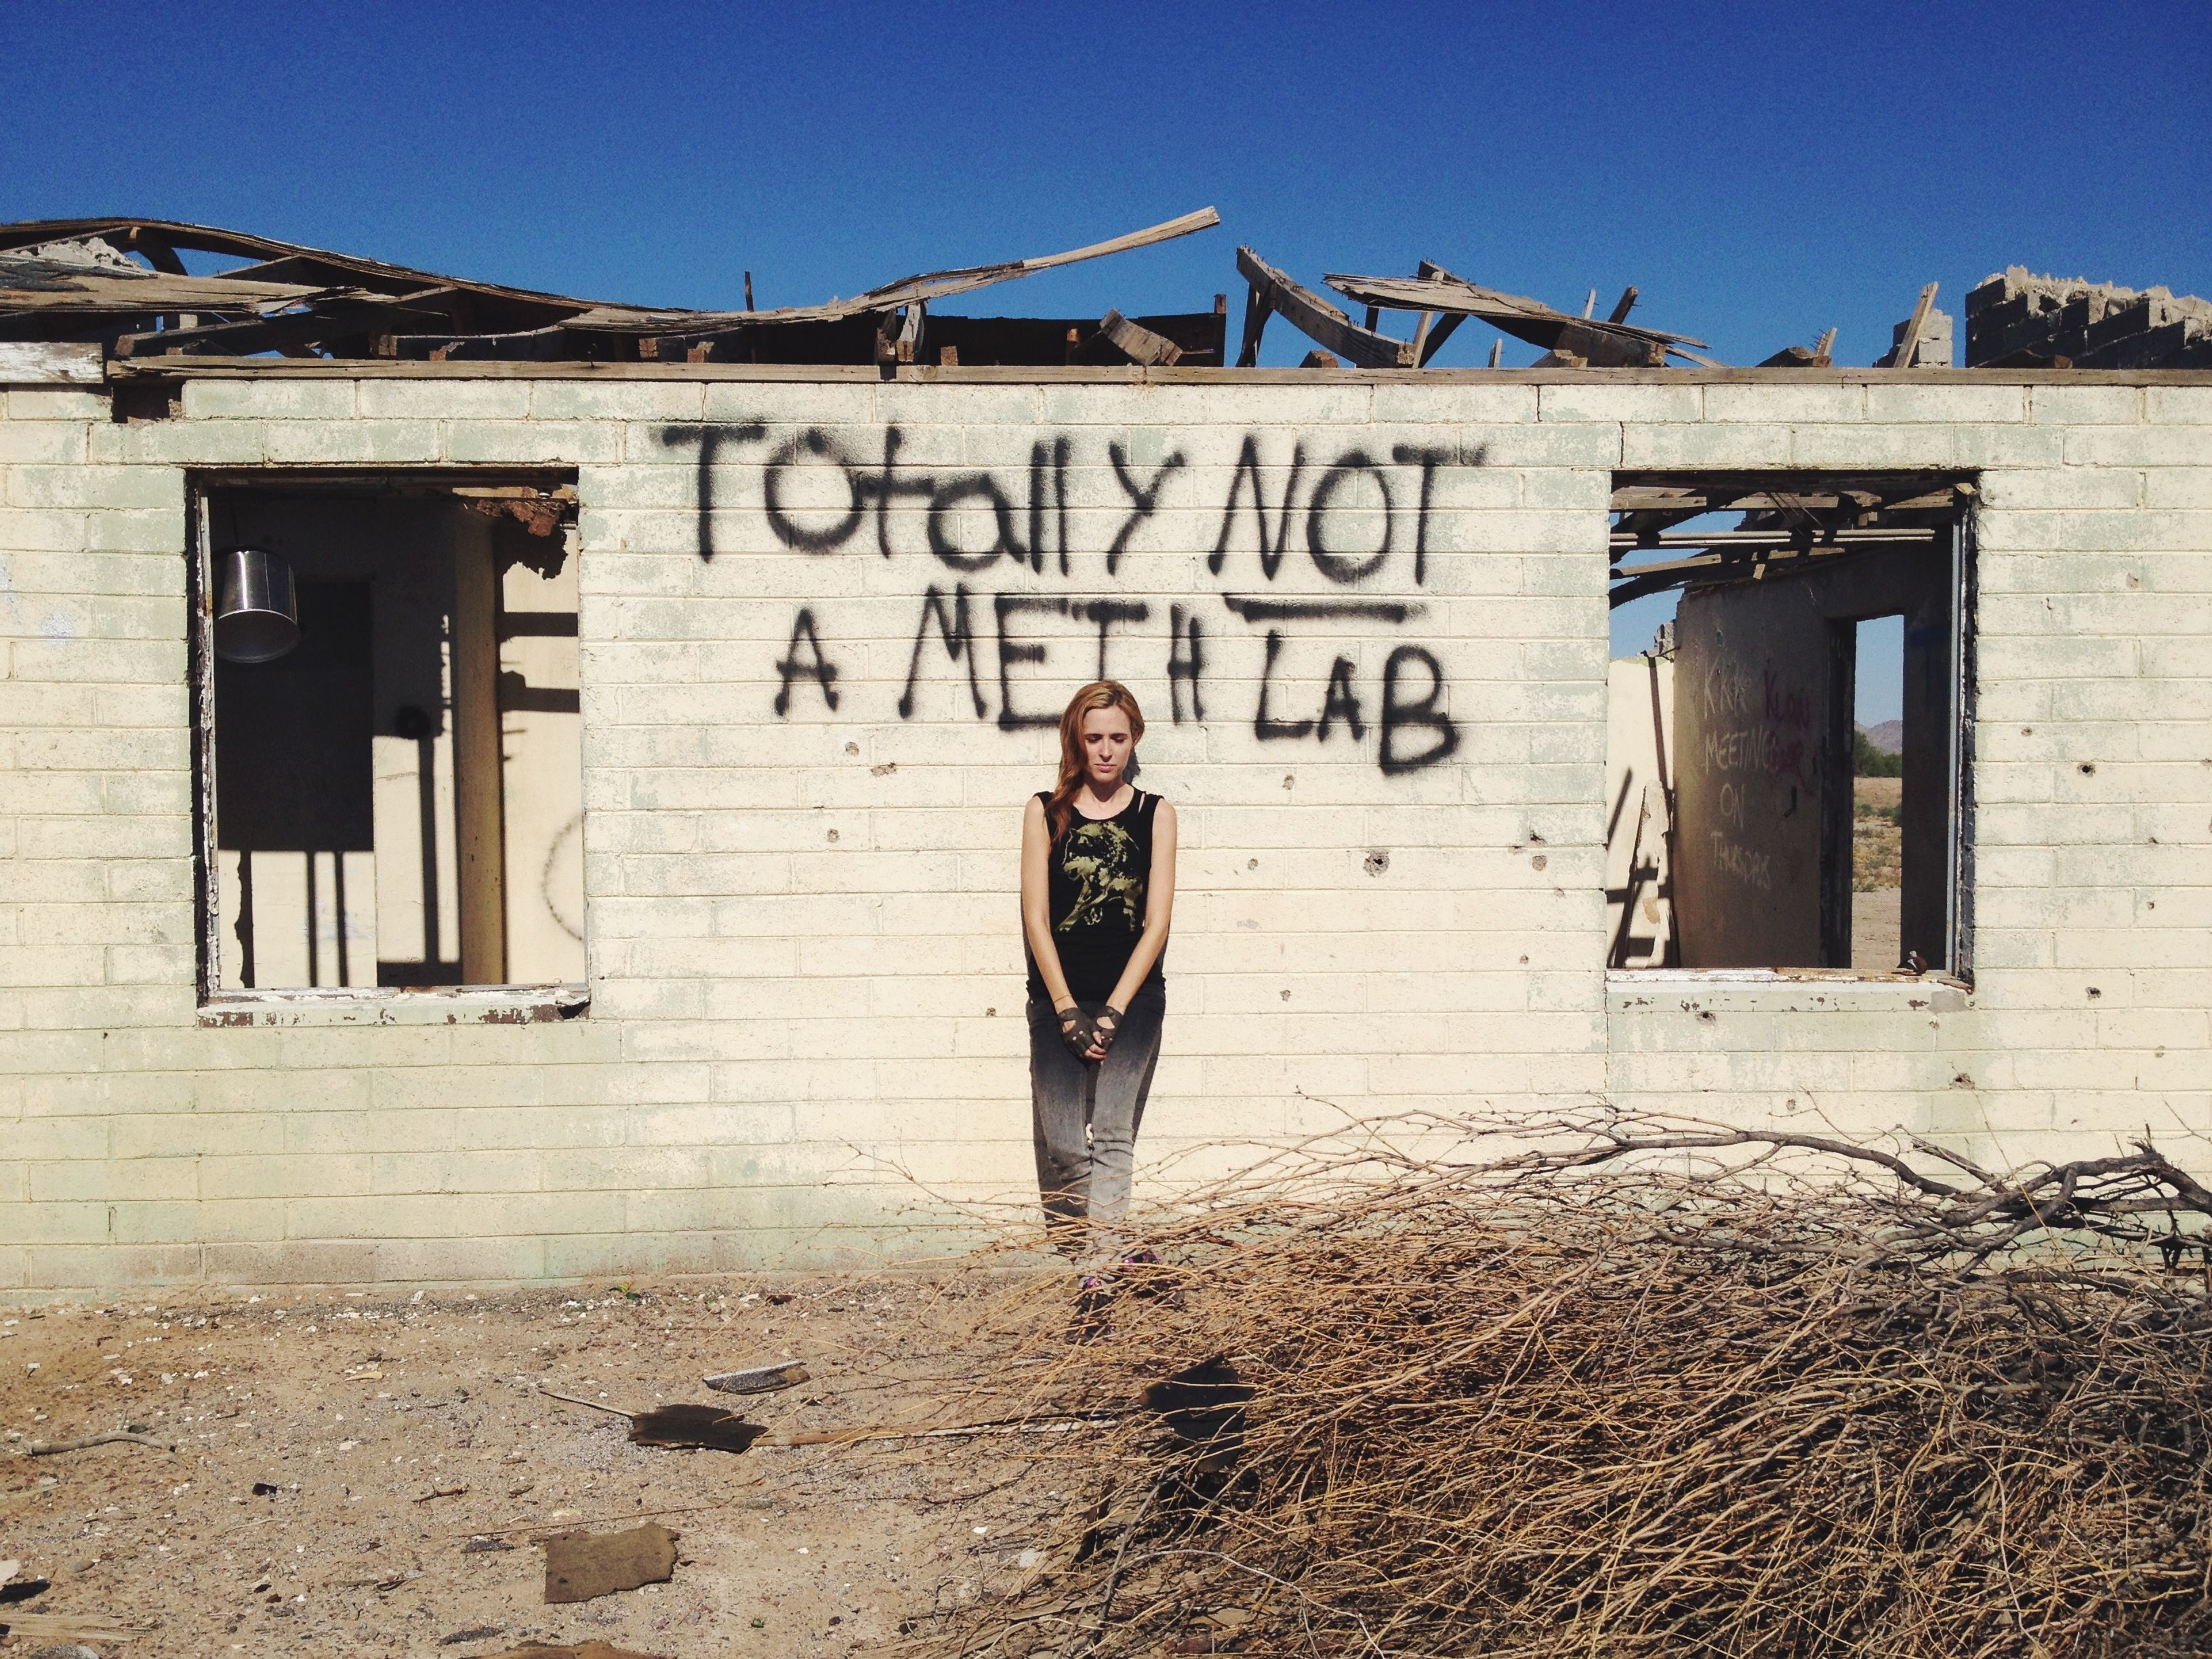 Totally NOT a meth lab // Goodyear, AZ